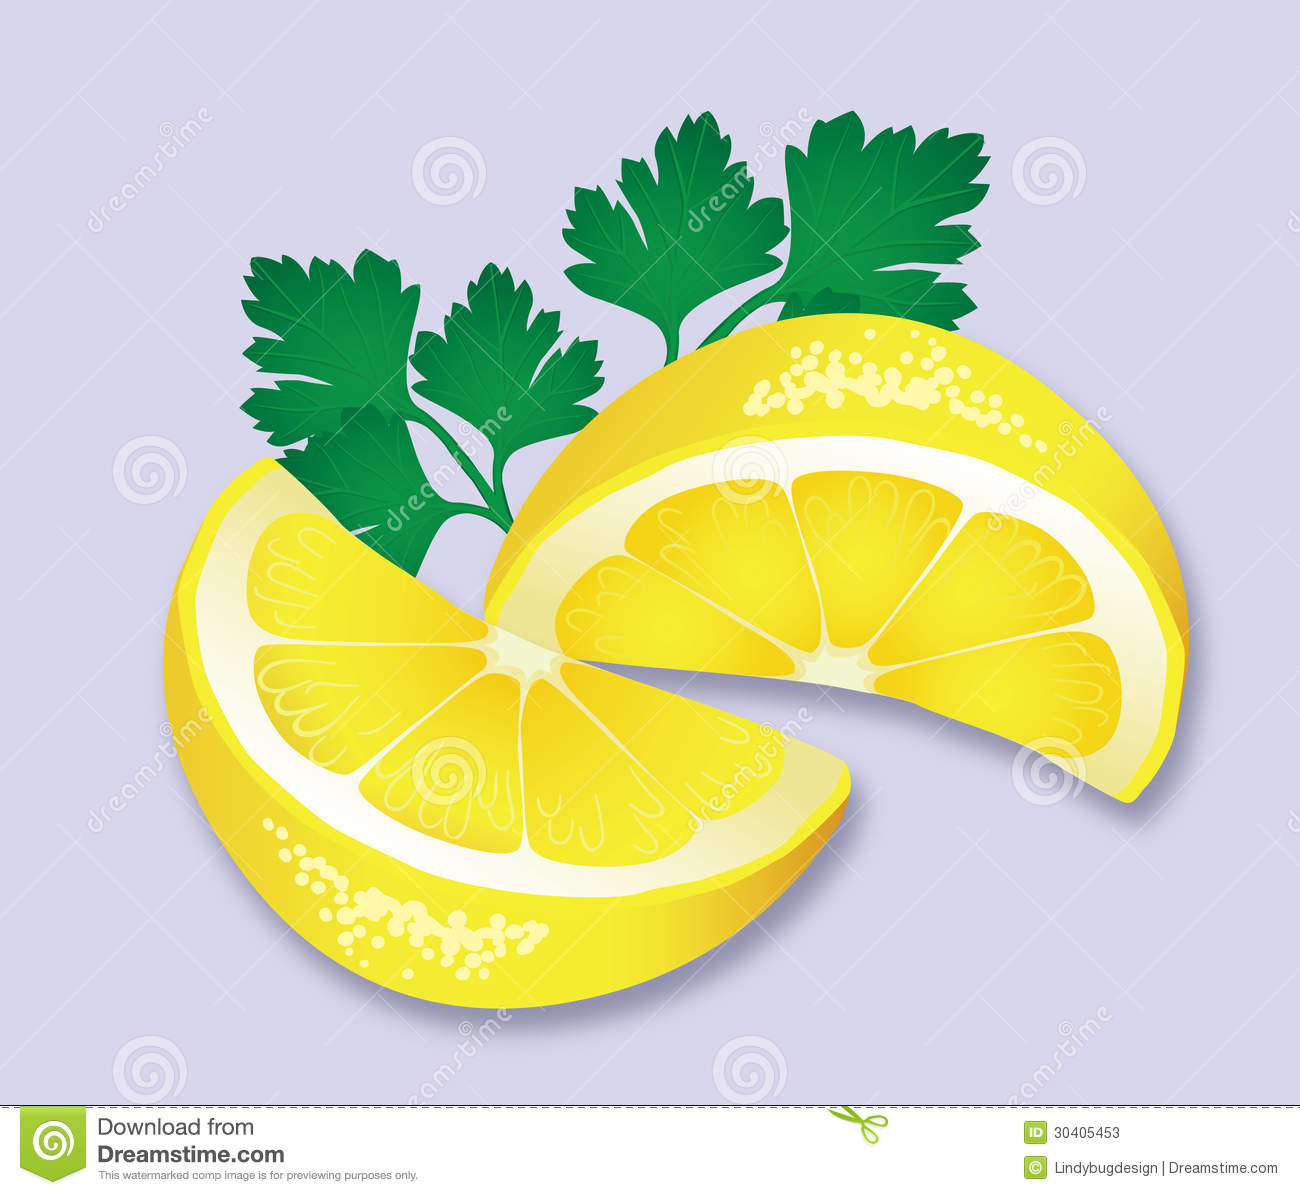 Lemon And Parsley Garnish Stock Photos.